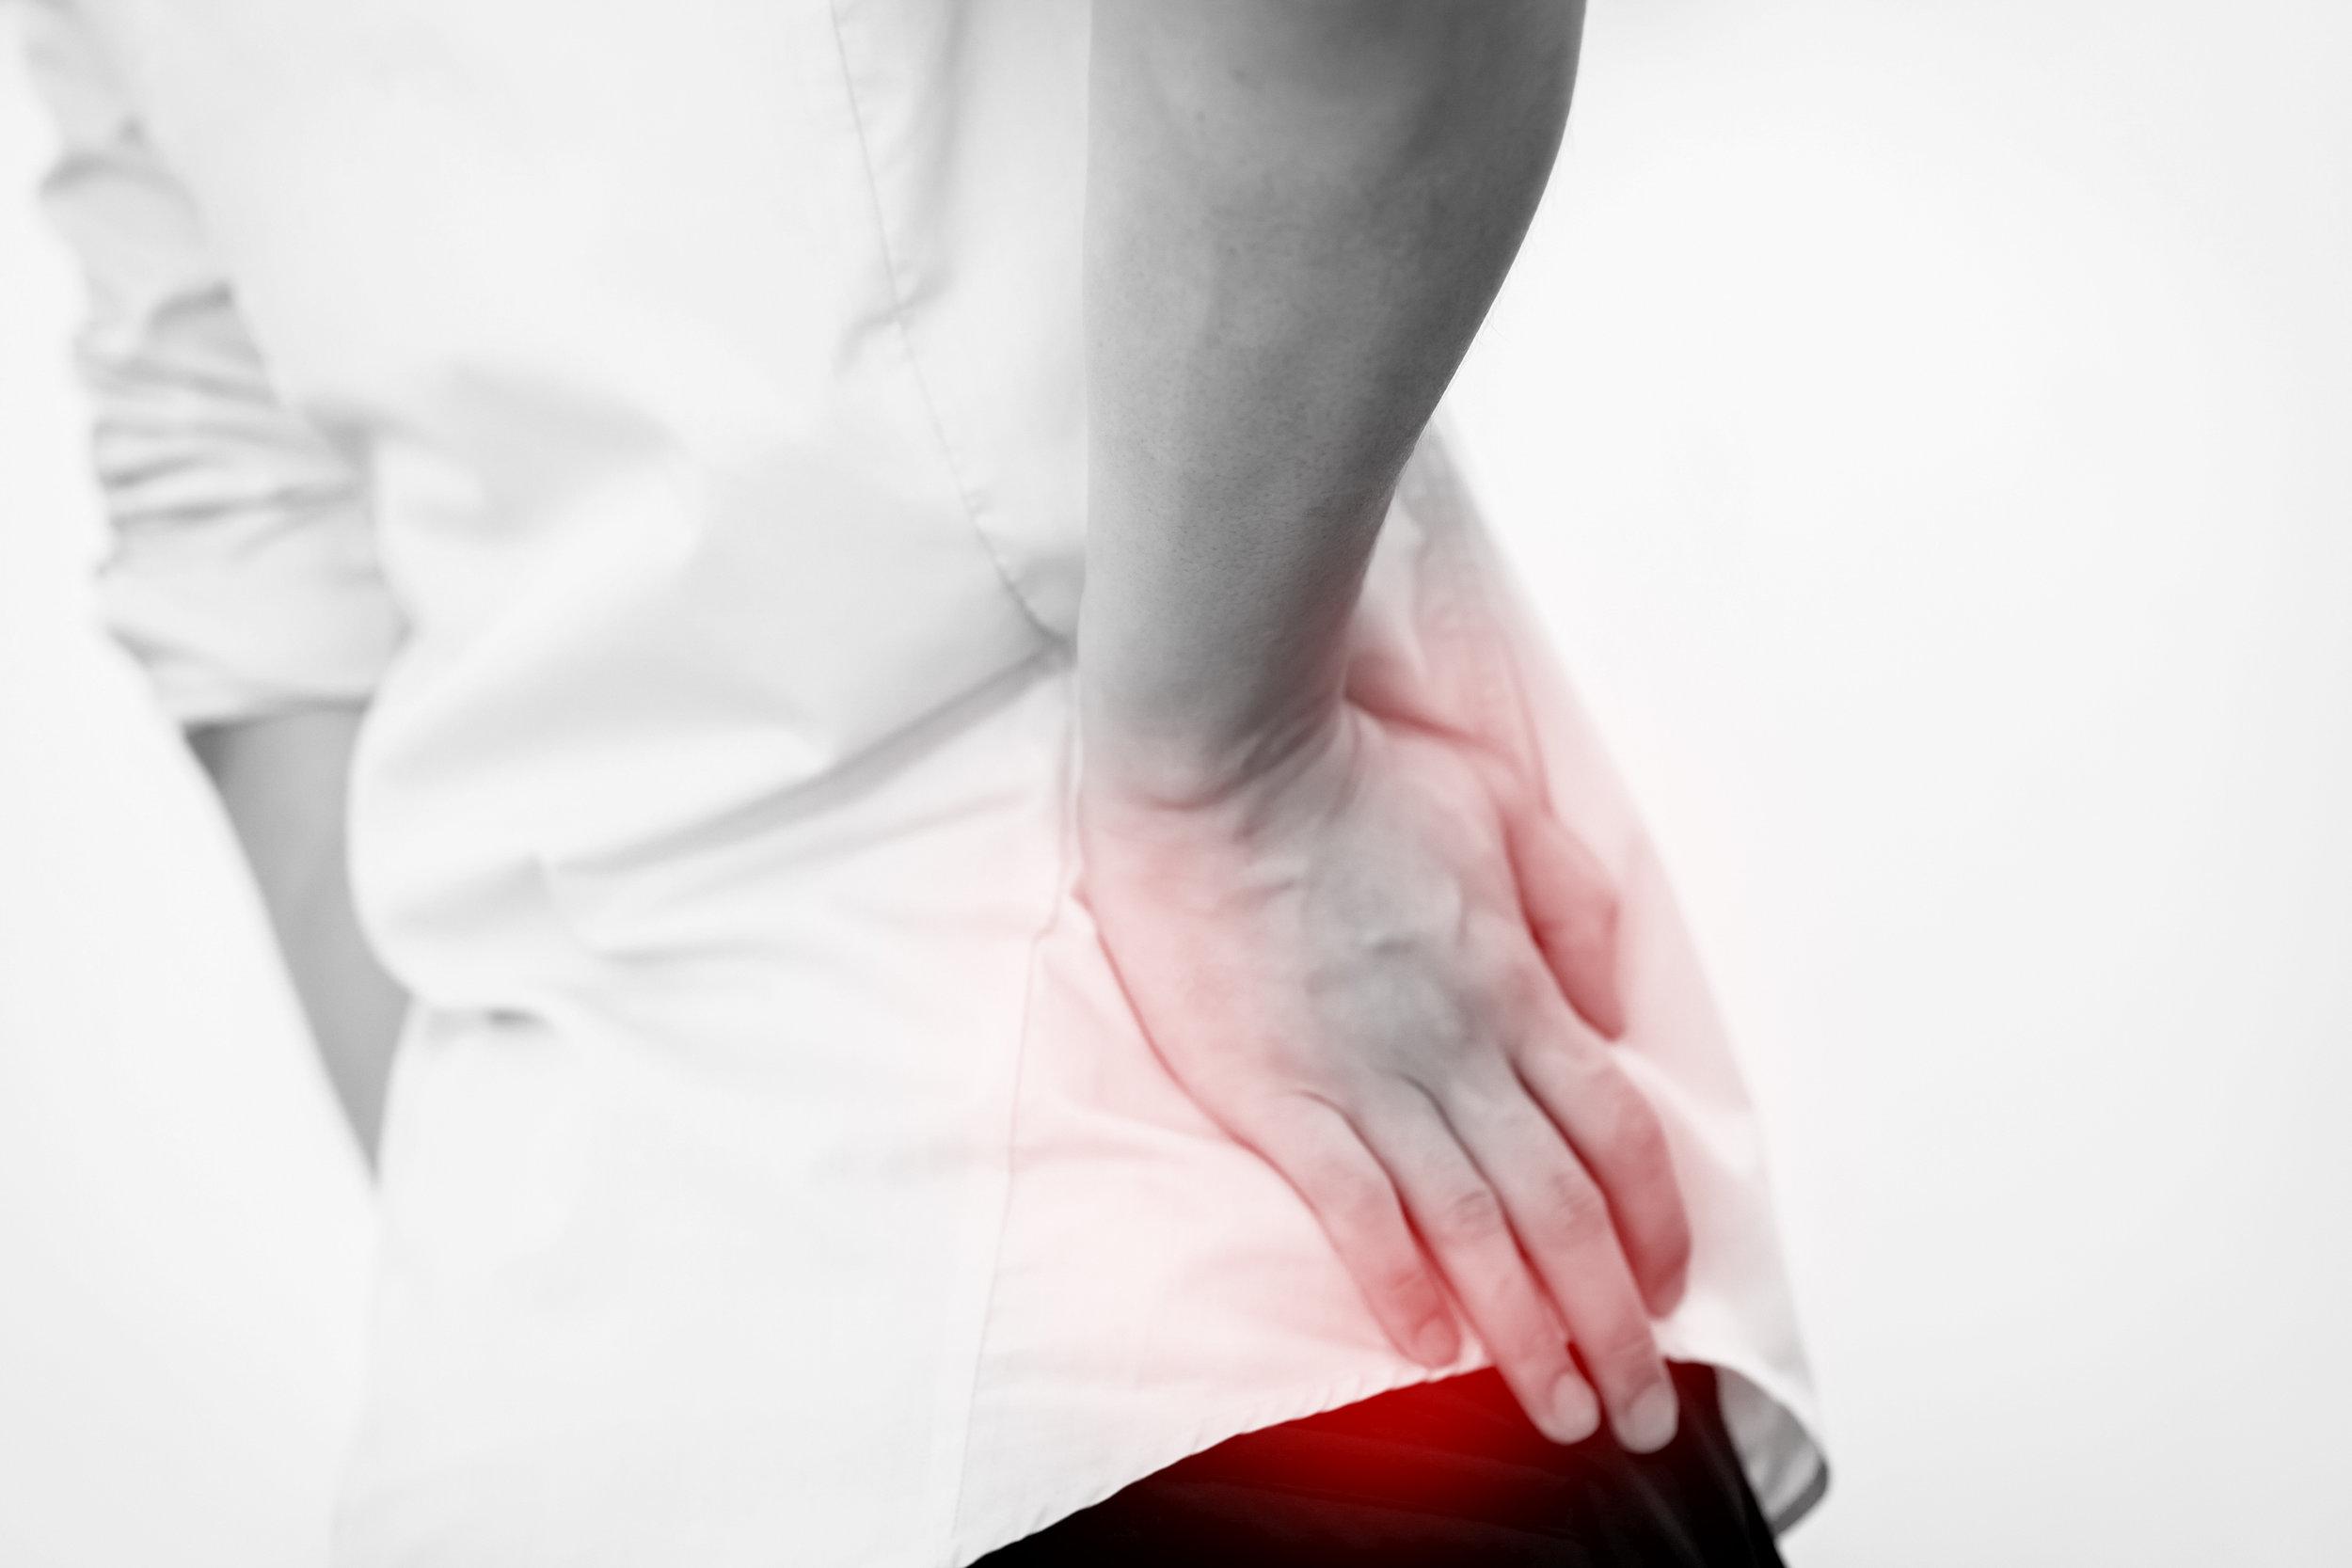 lateral-hip-pain-trochanteric-bursitis-treatment